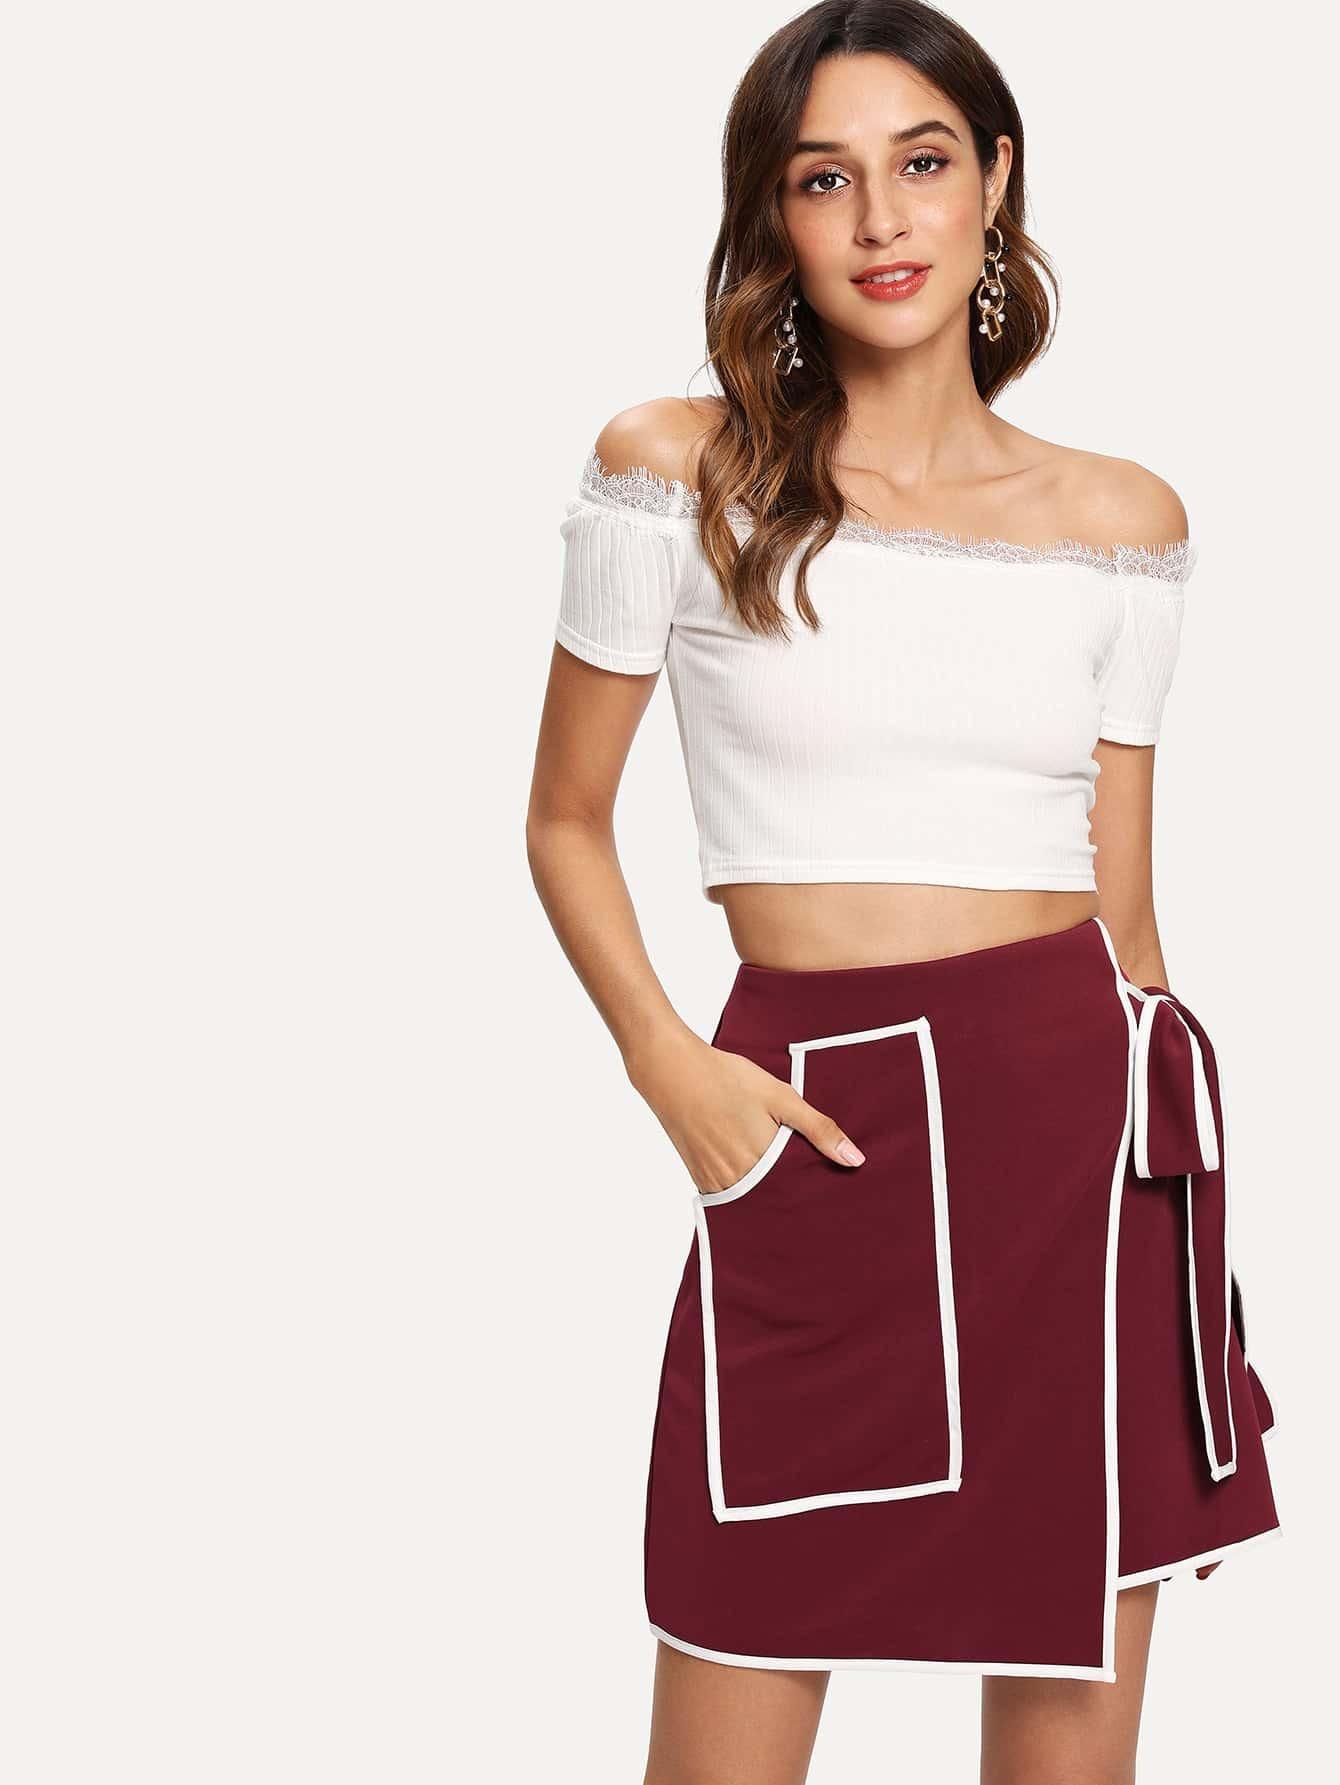 Купить Оберните юбку карманного узла, Gabi B, SheIn